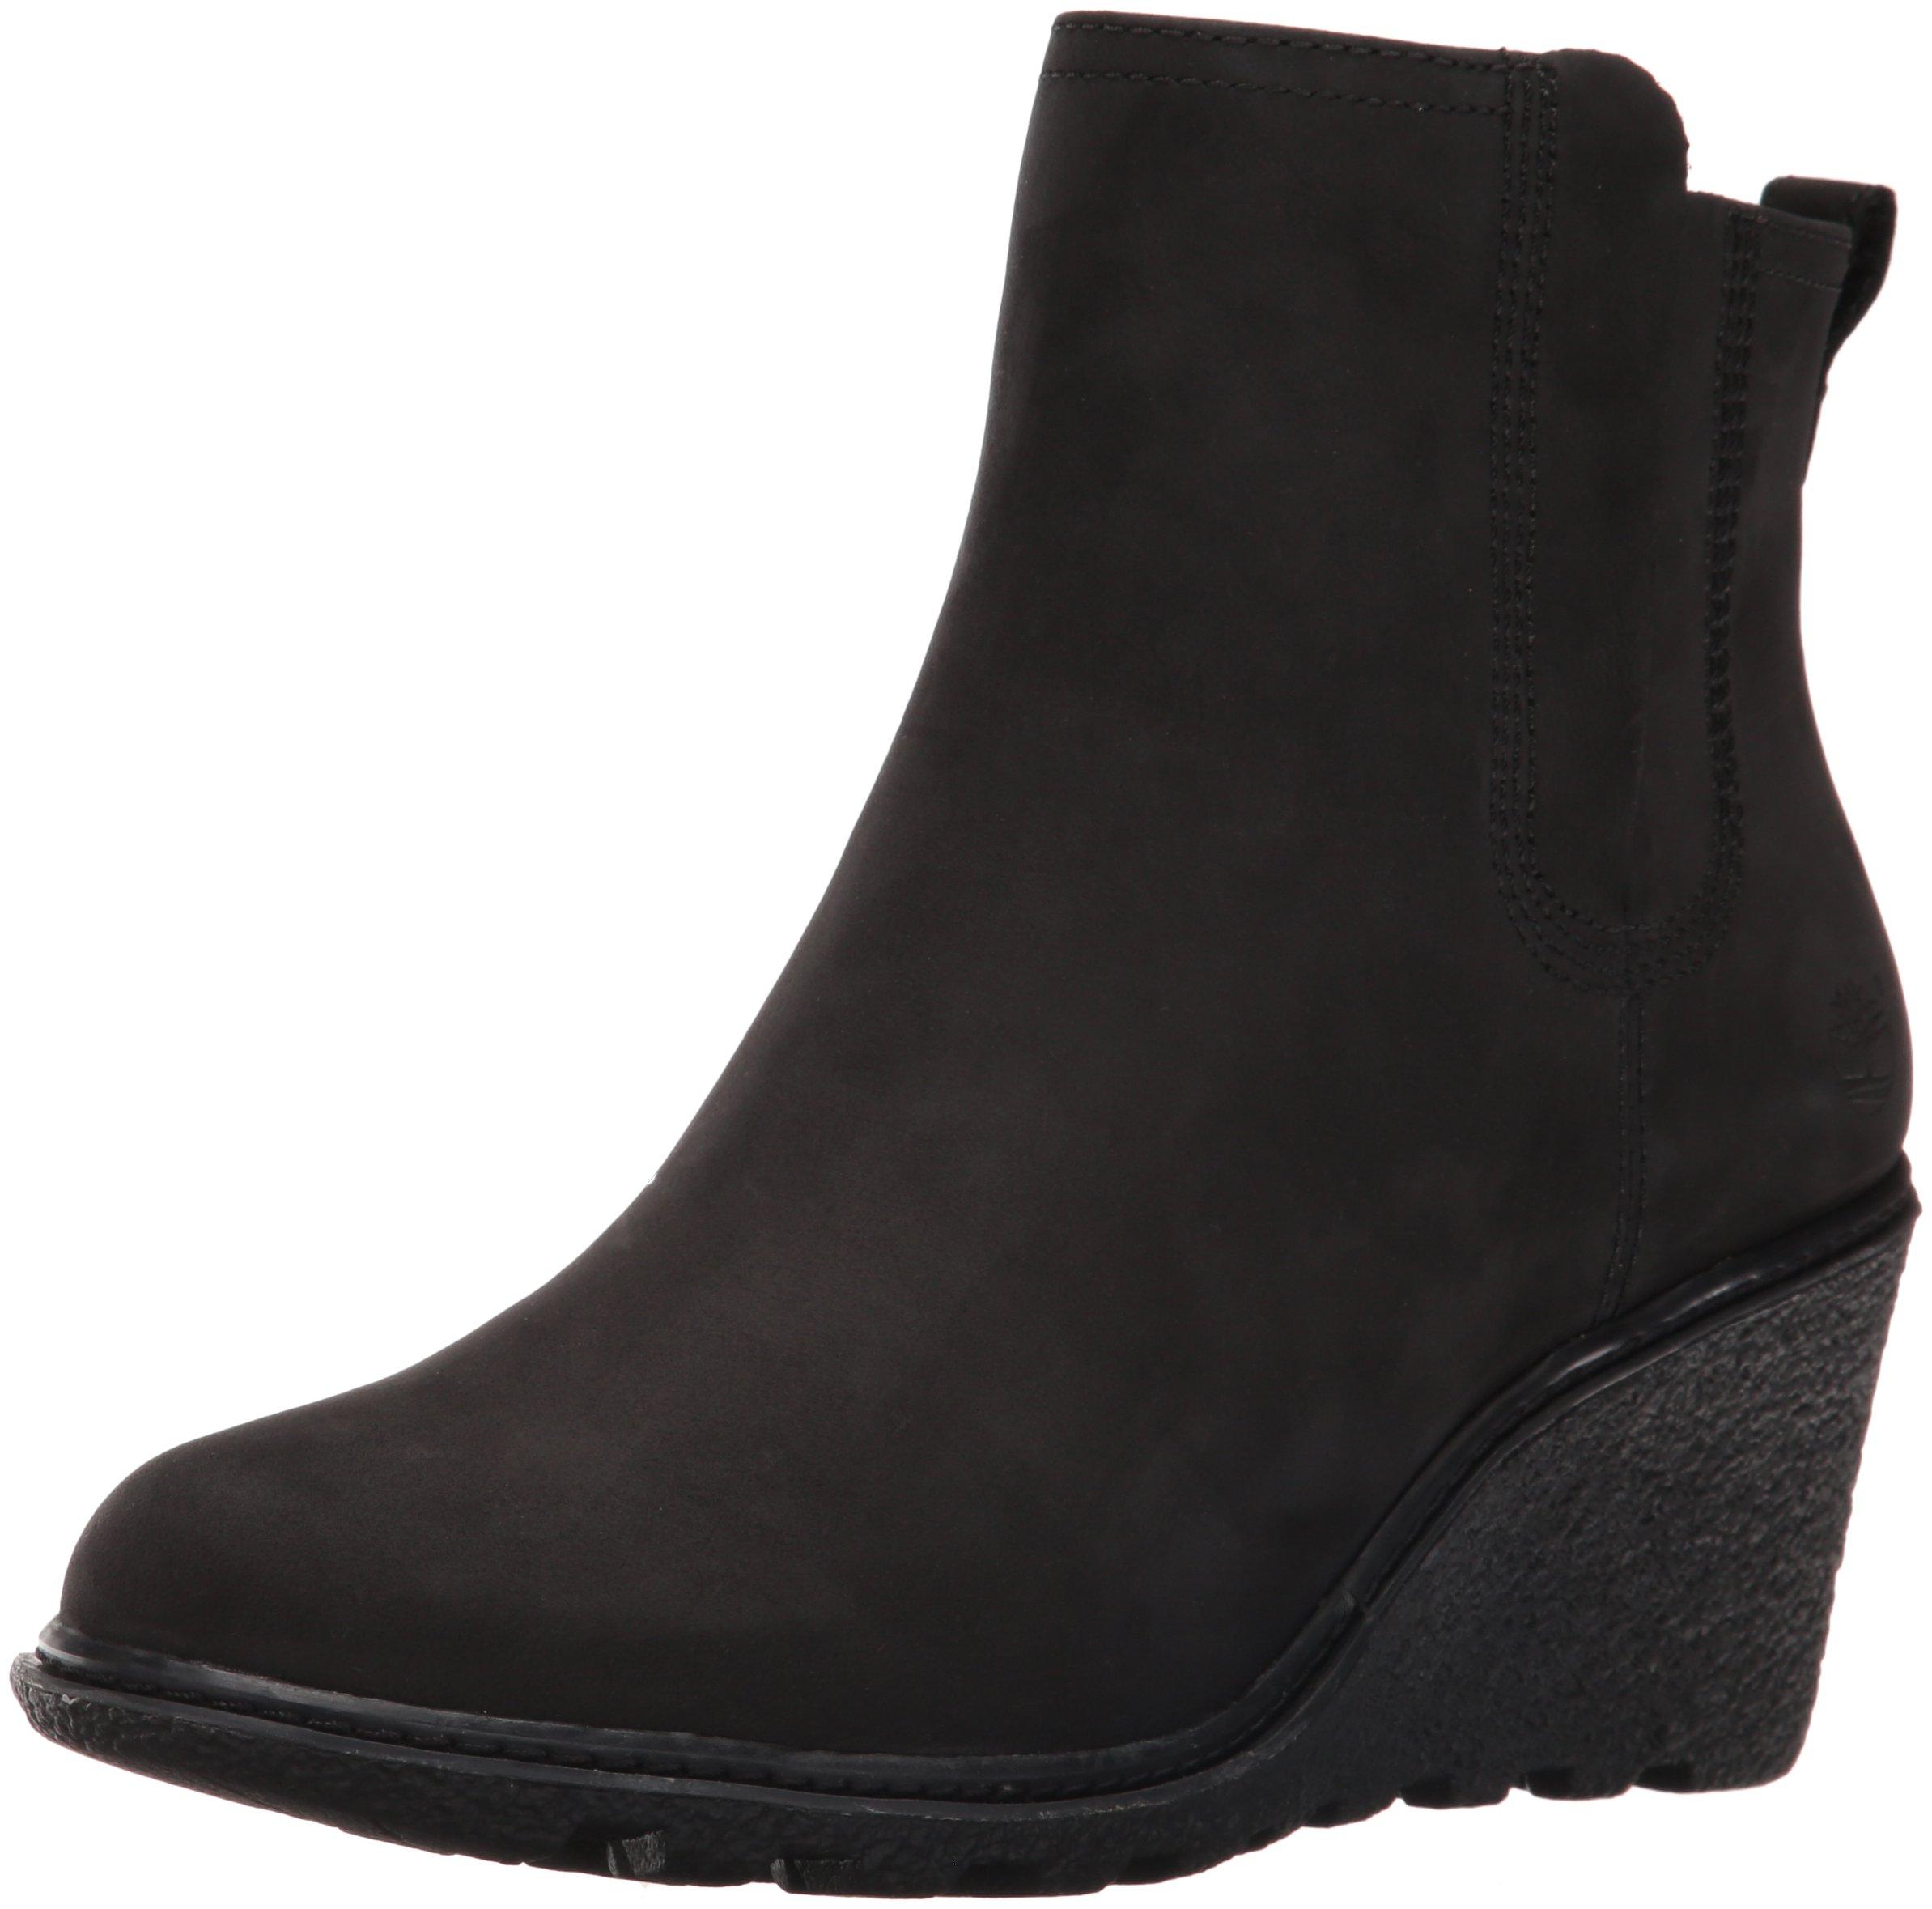 Timberland Women's Amston Chelsea Boot,Black Nubuck,9 M US